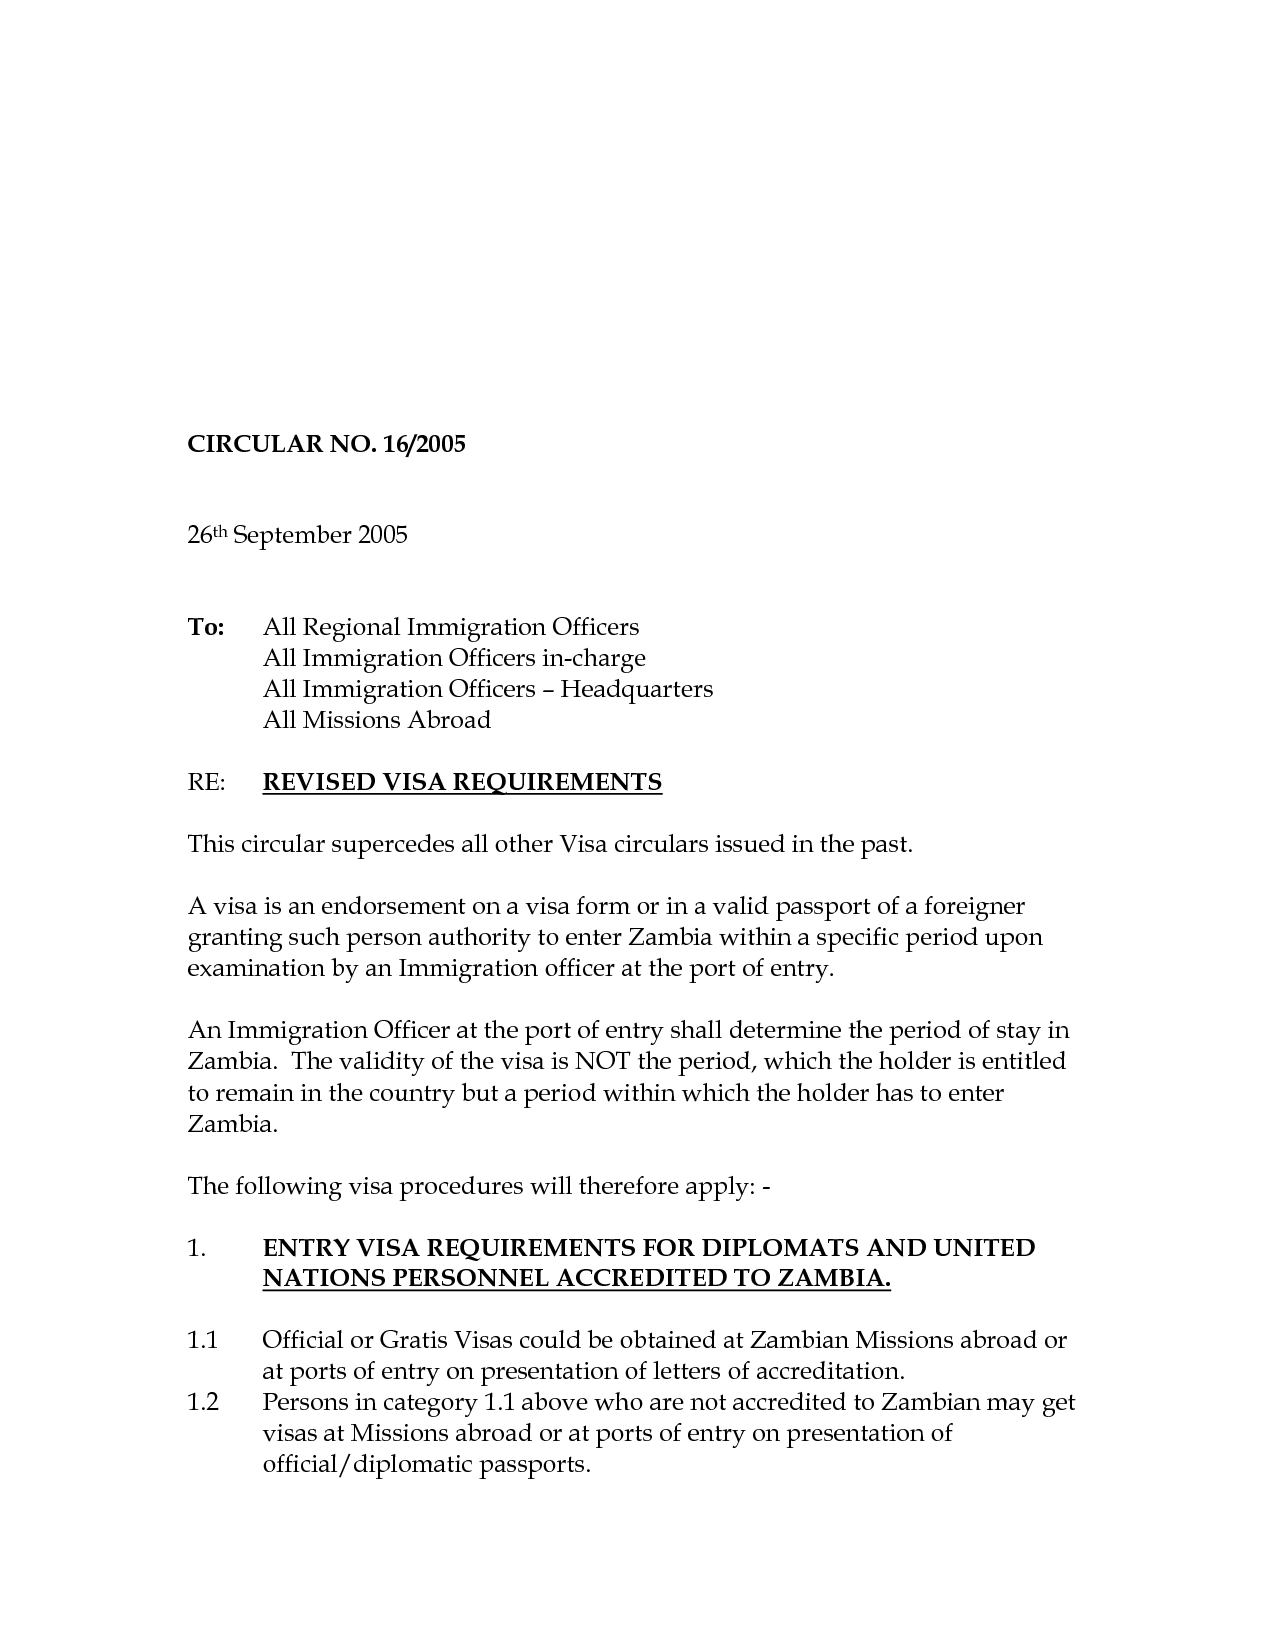 Request Letter For Malaysia Visa Success Destiny Buildersuccessvisa  Invitation Letter To A Friend Example Application Letter Sample